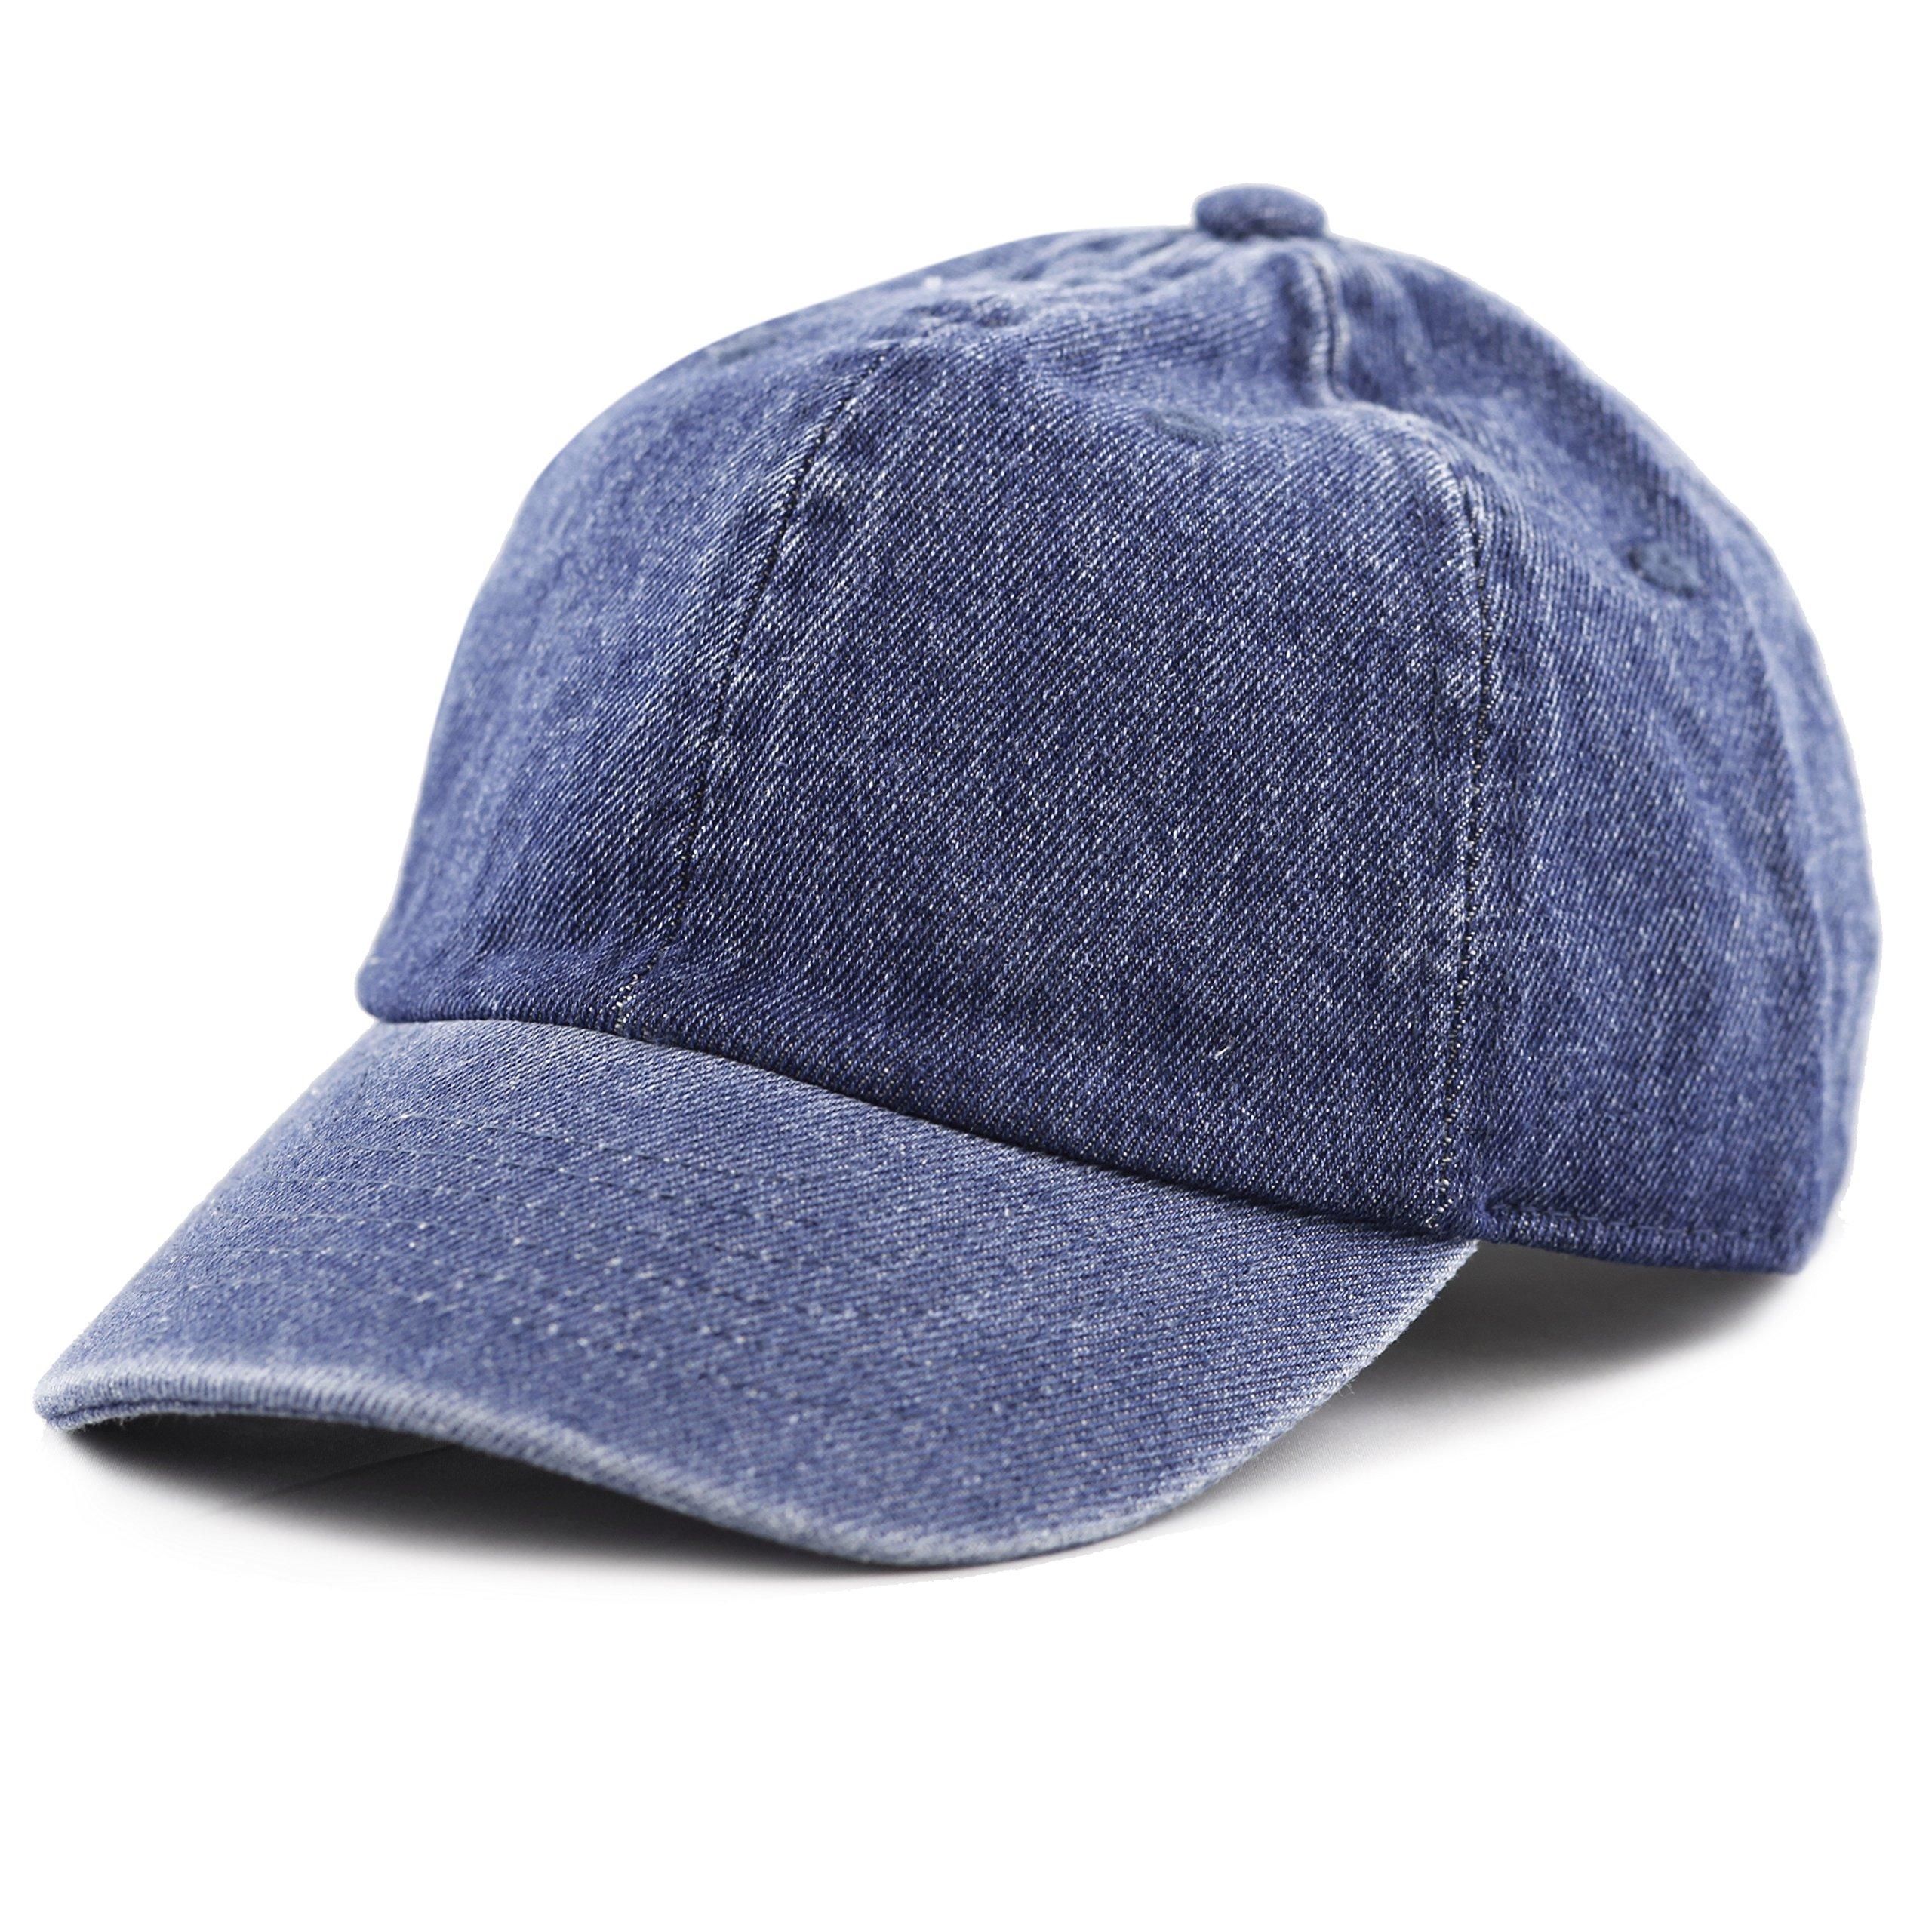 THE HAT DEPOT Kids Washed Low Profile Cotton and Denim Plain Baseball Cap Hat (6-9yrs, Dark Denim)